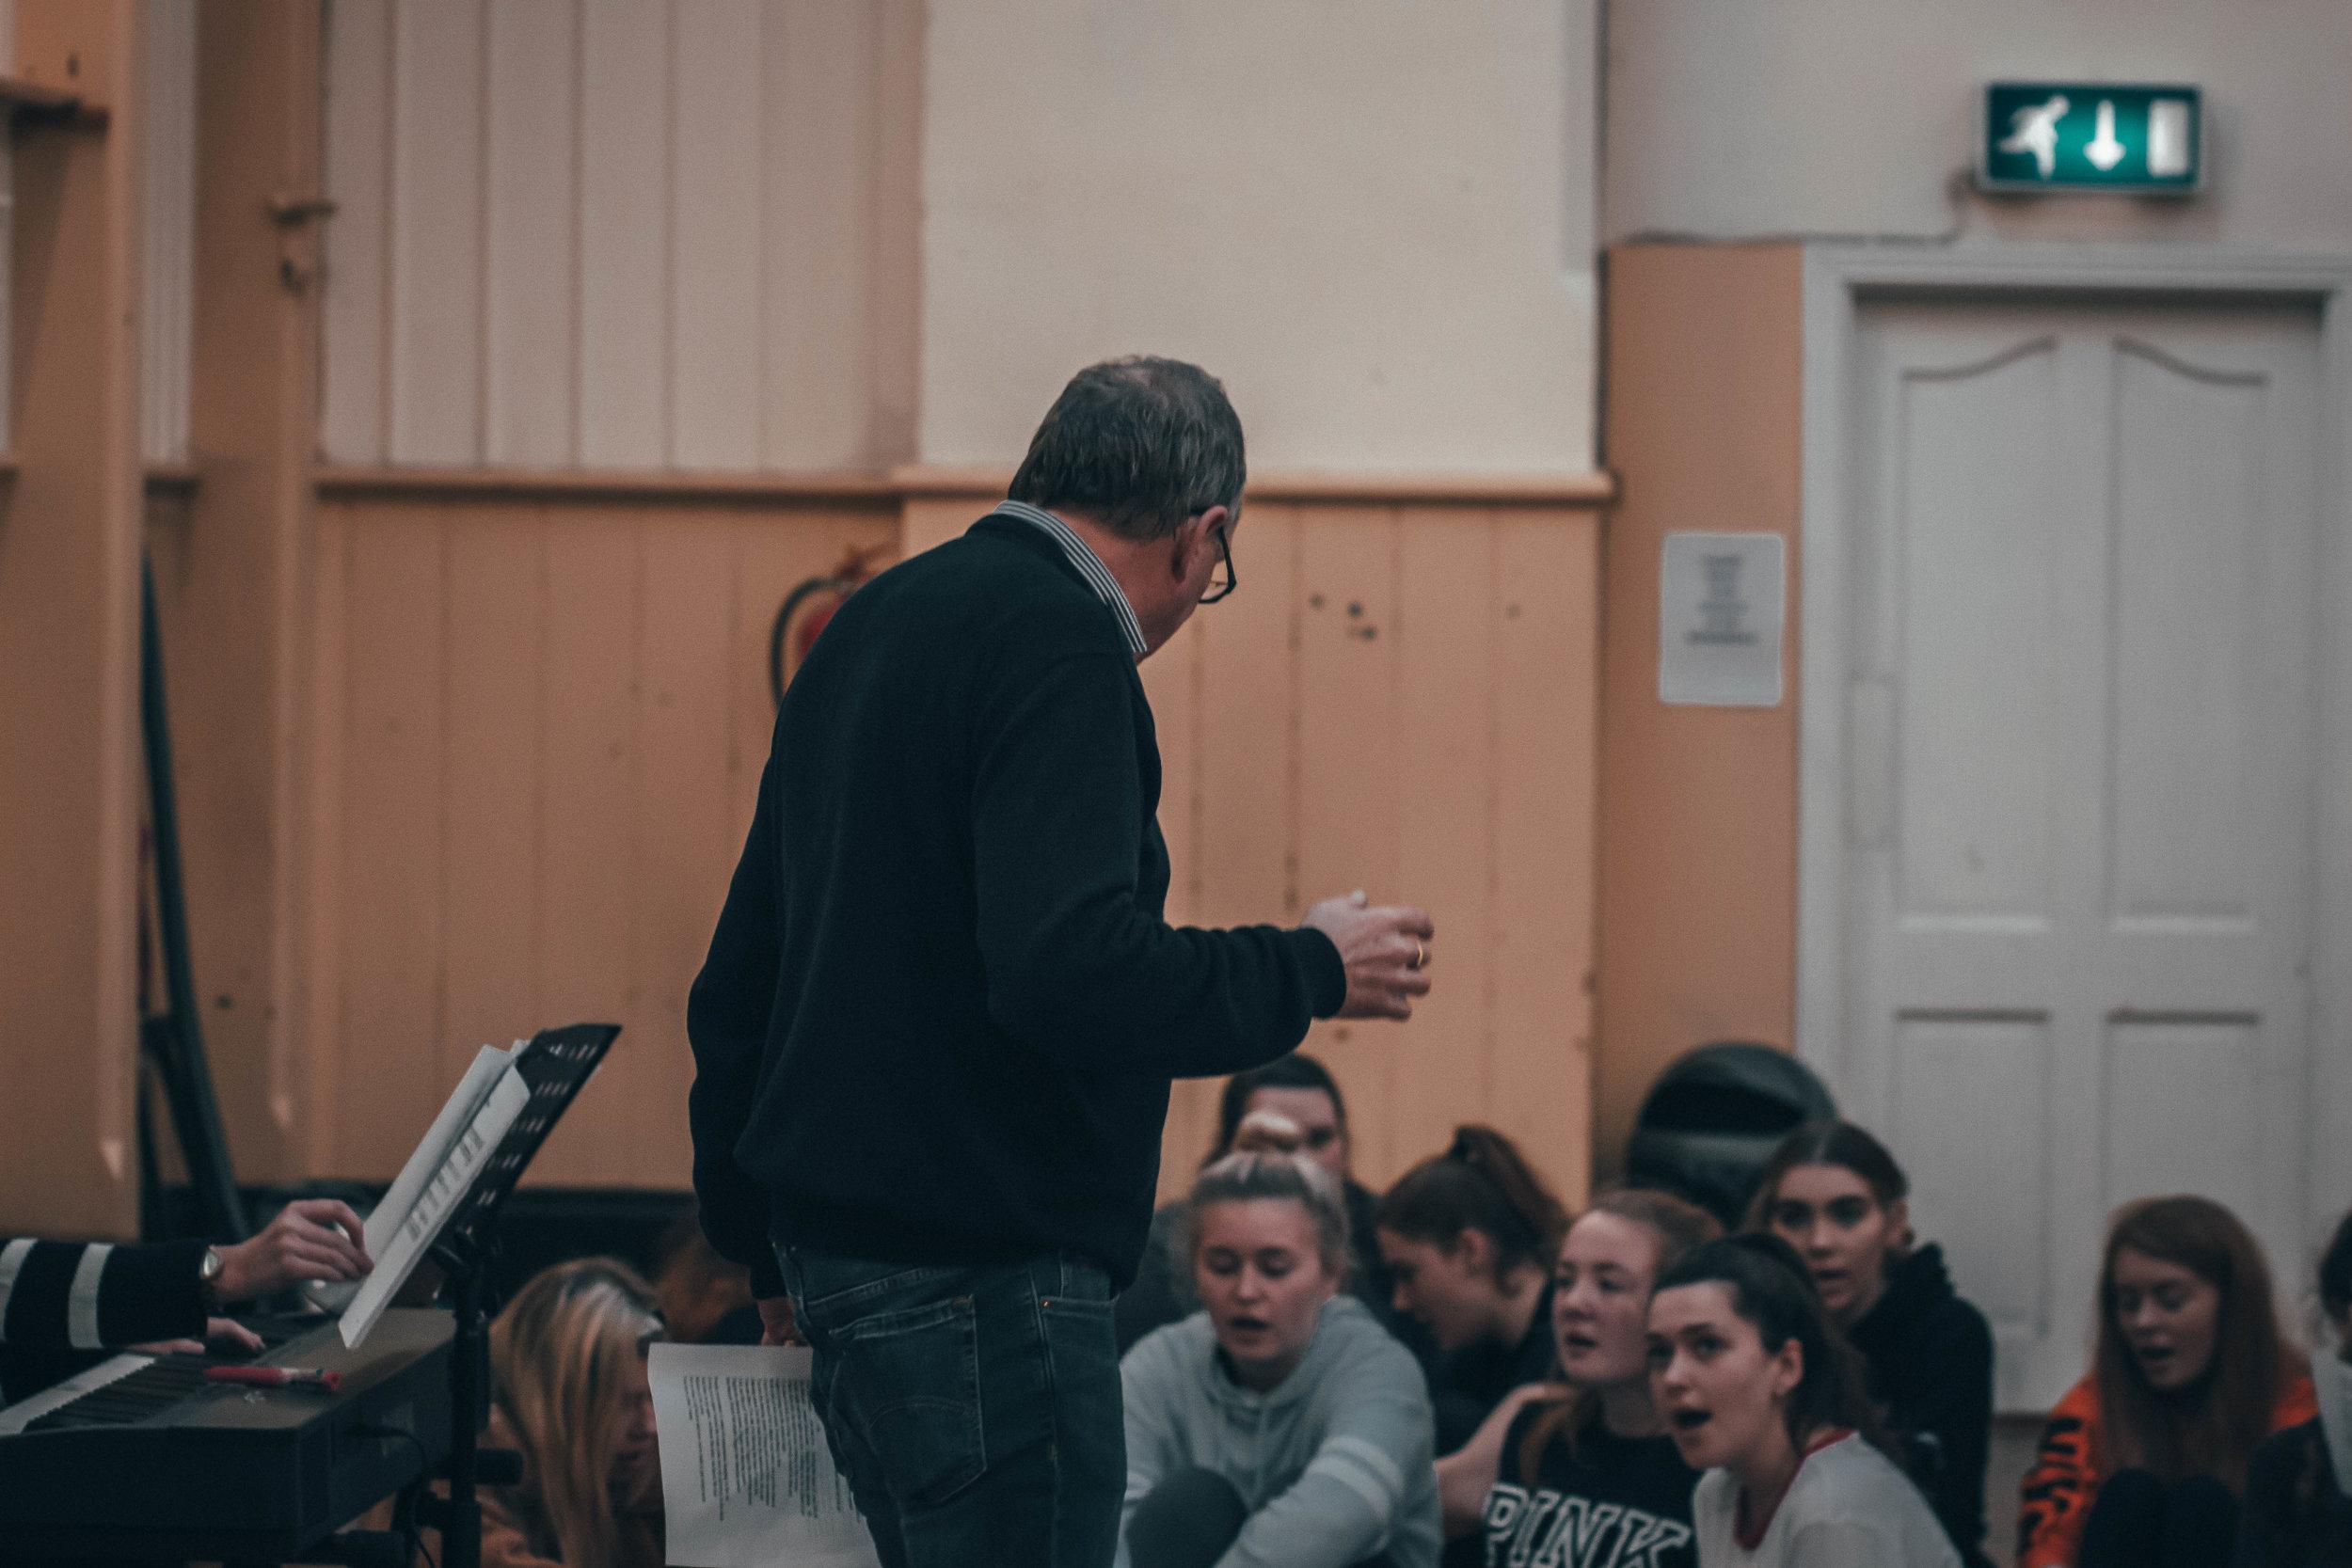 LSP_Rehearsal-4748.jpg